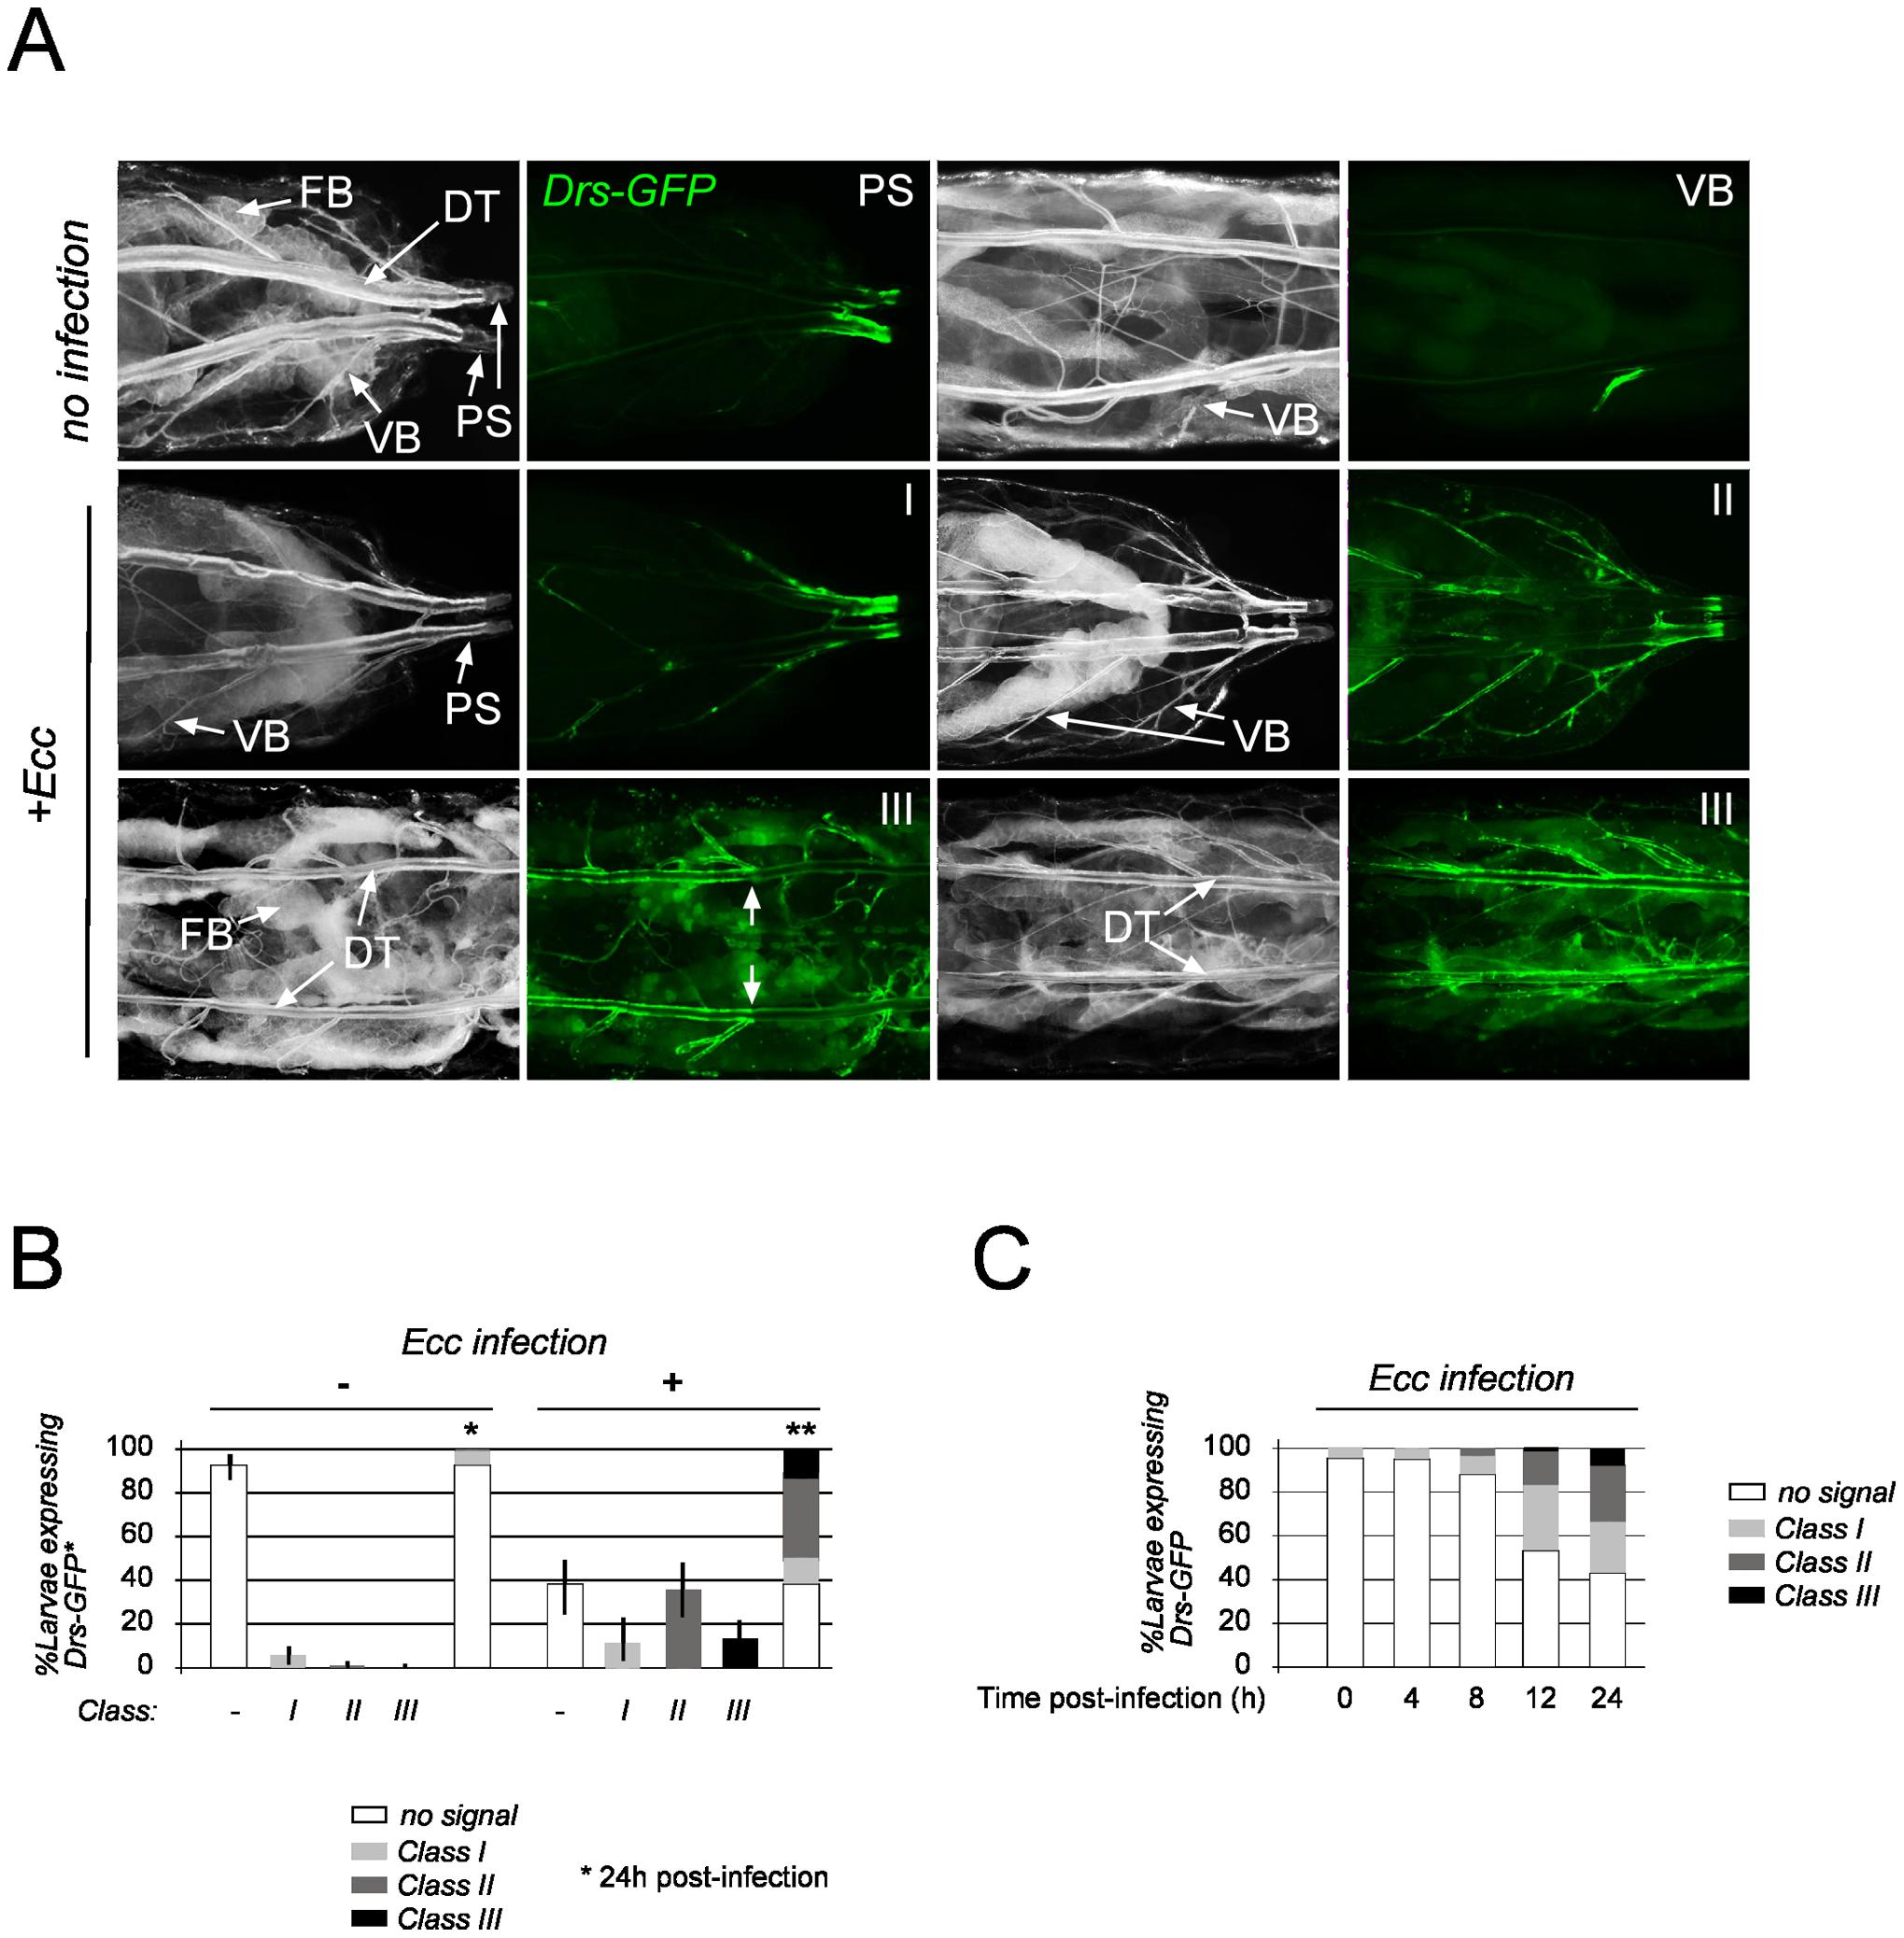 Spatio-temporal expression of tracheal <i>Drosomycin-GFP</i>.